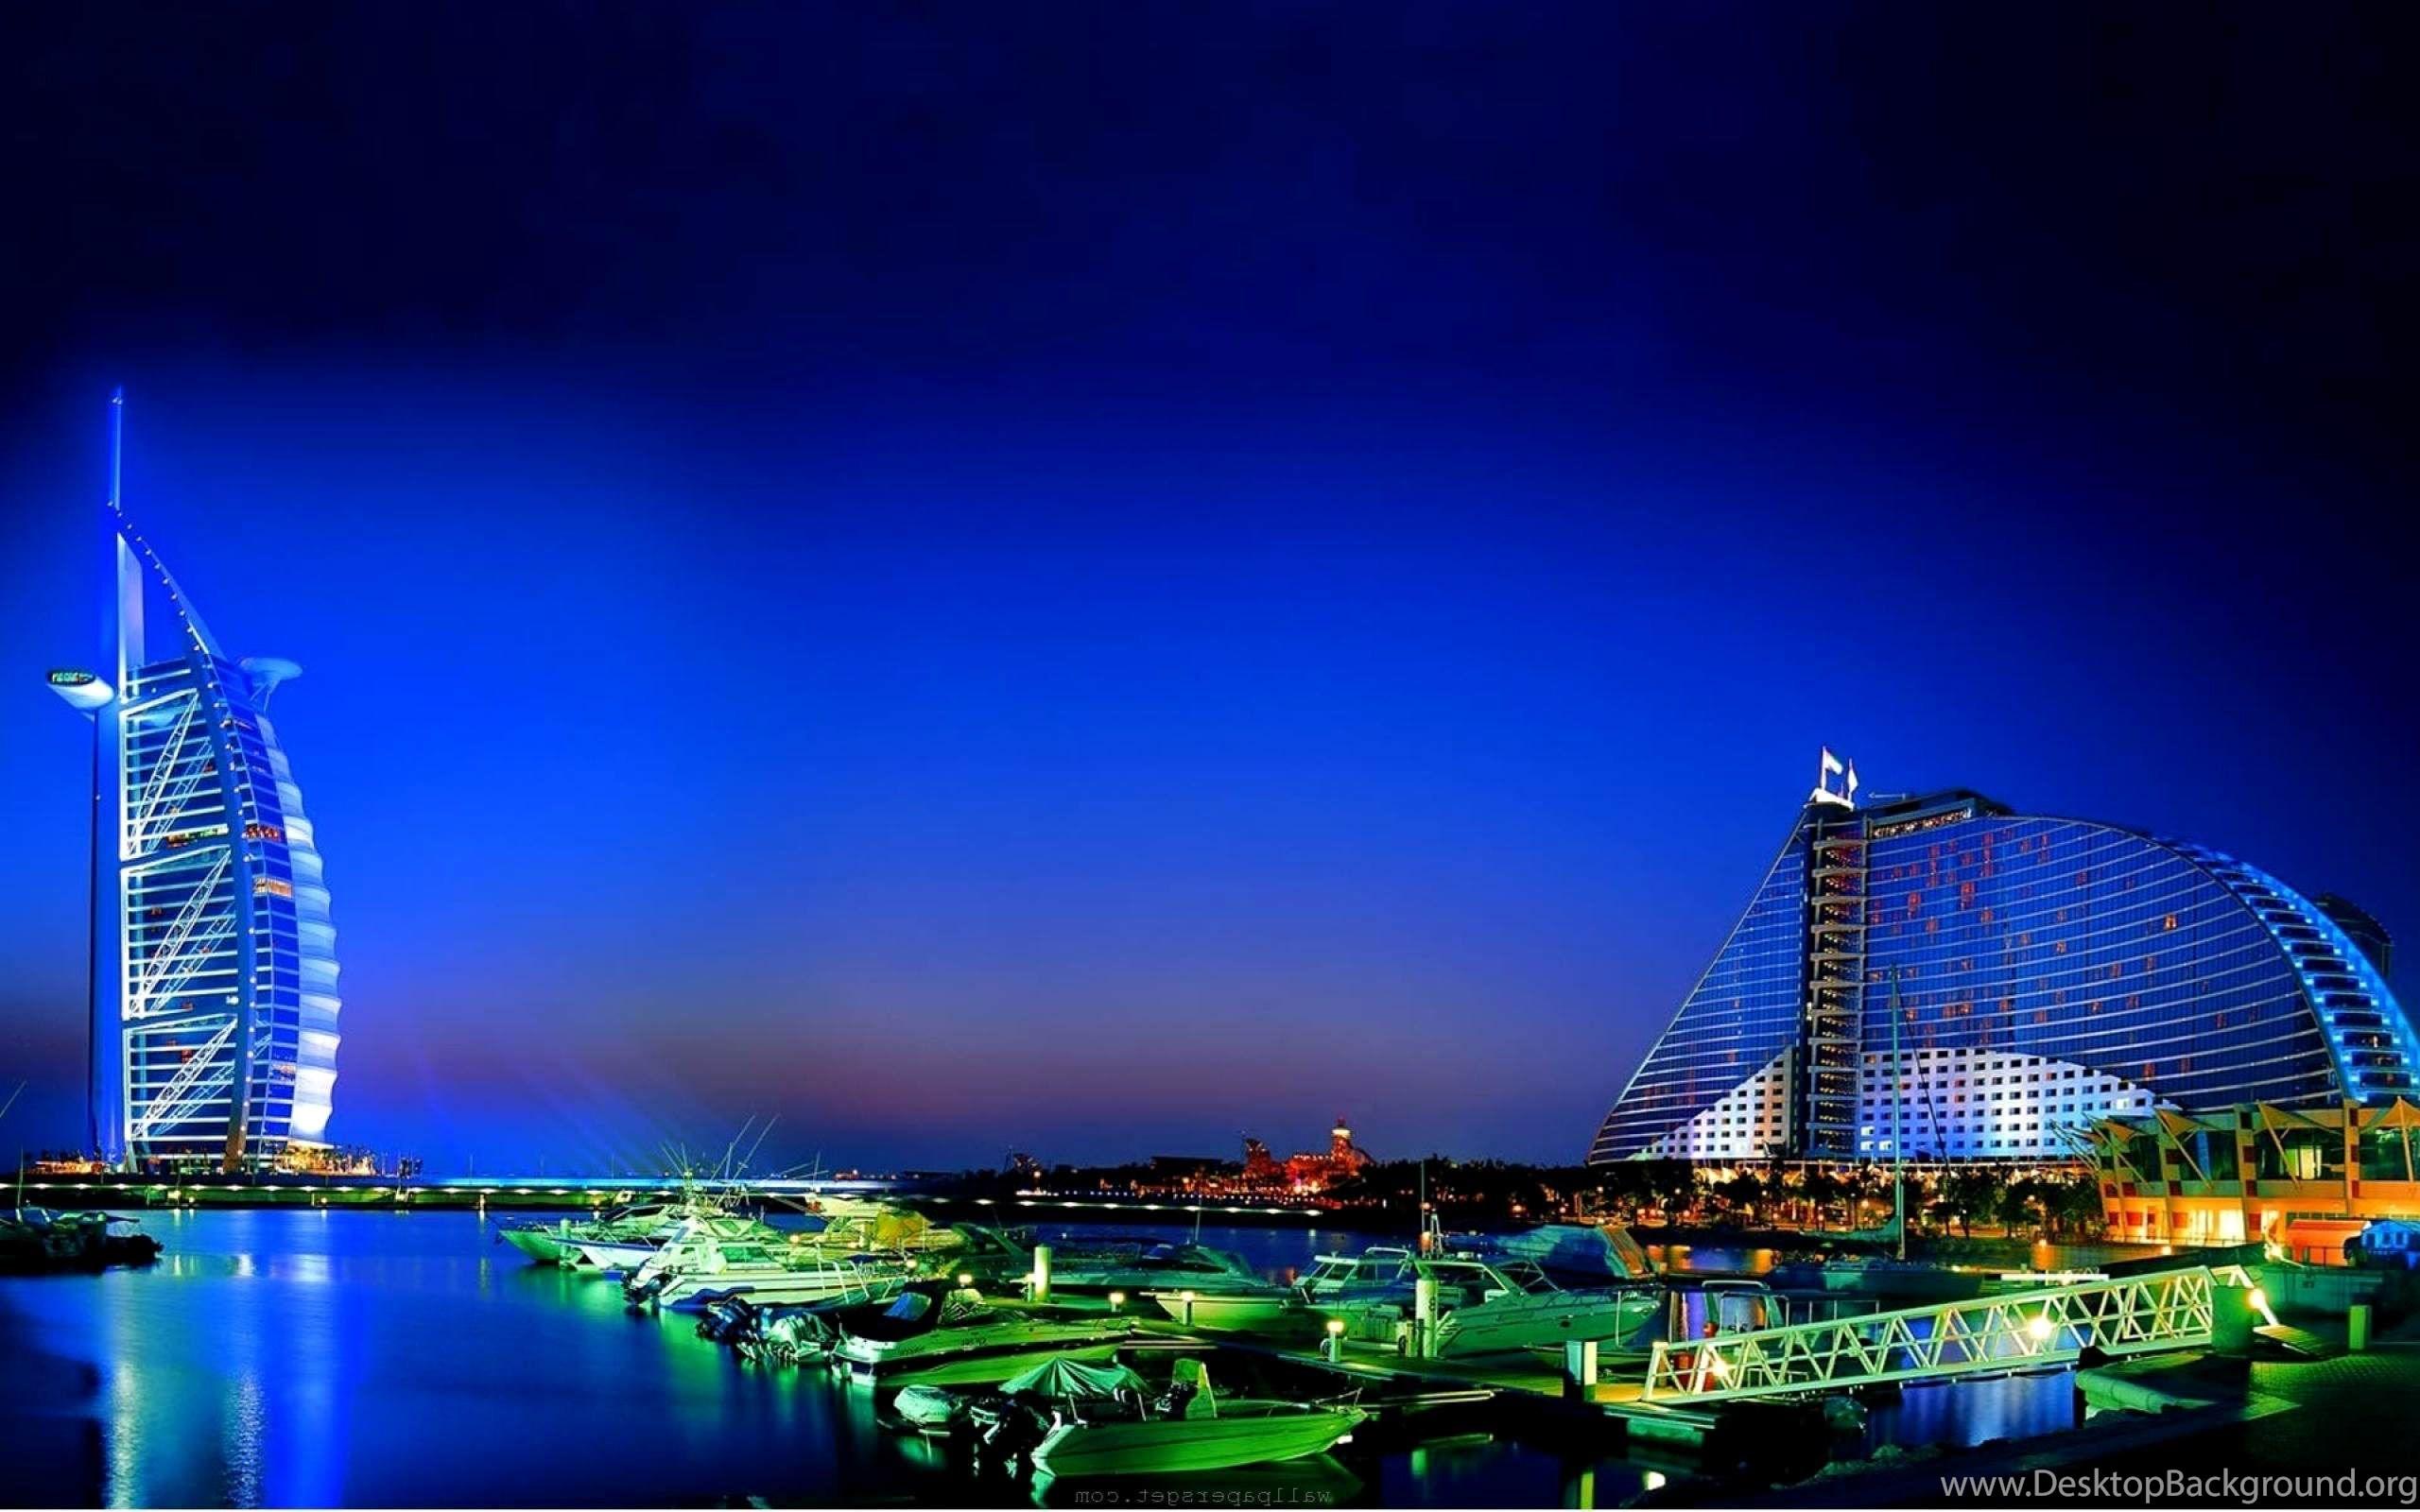 Dubai City Hd Wallpaper Backgrounds For Desktop Desktop Background